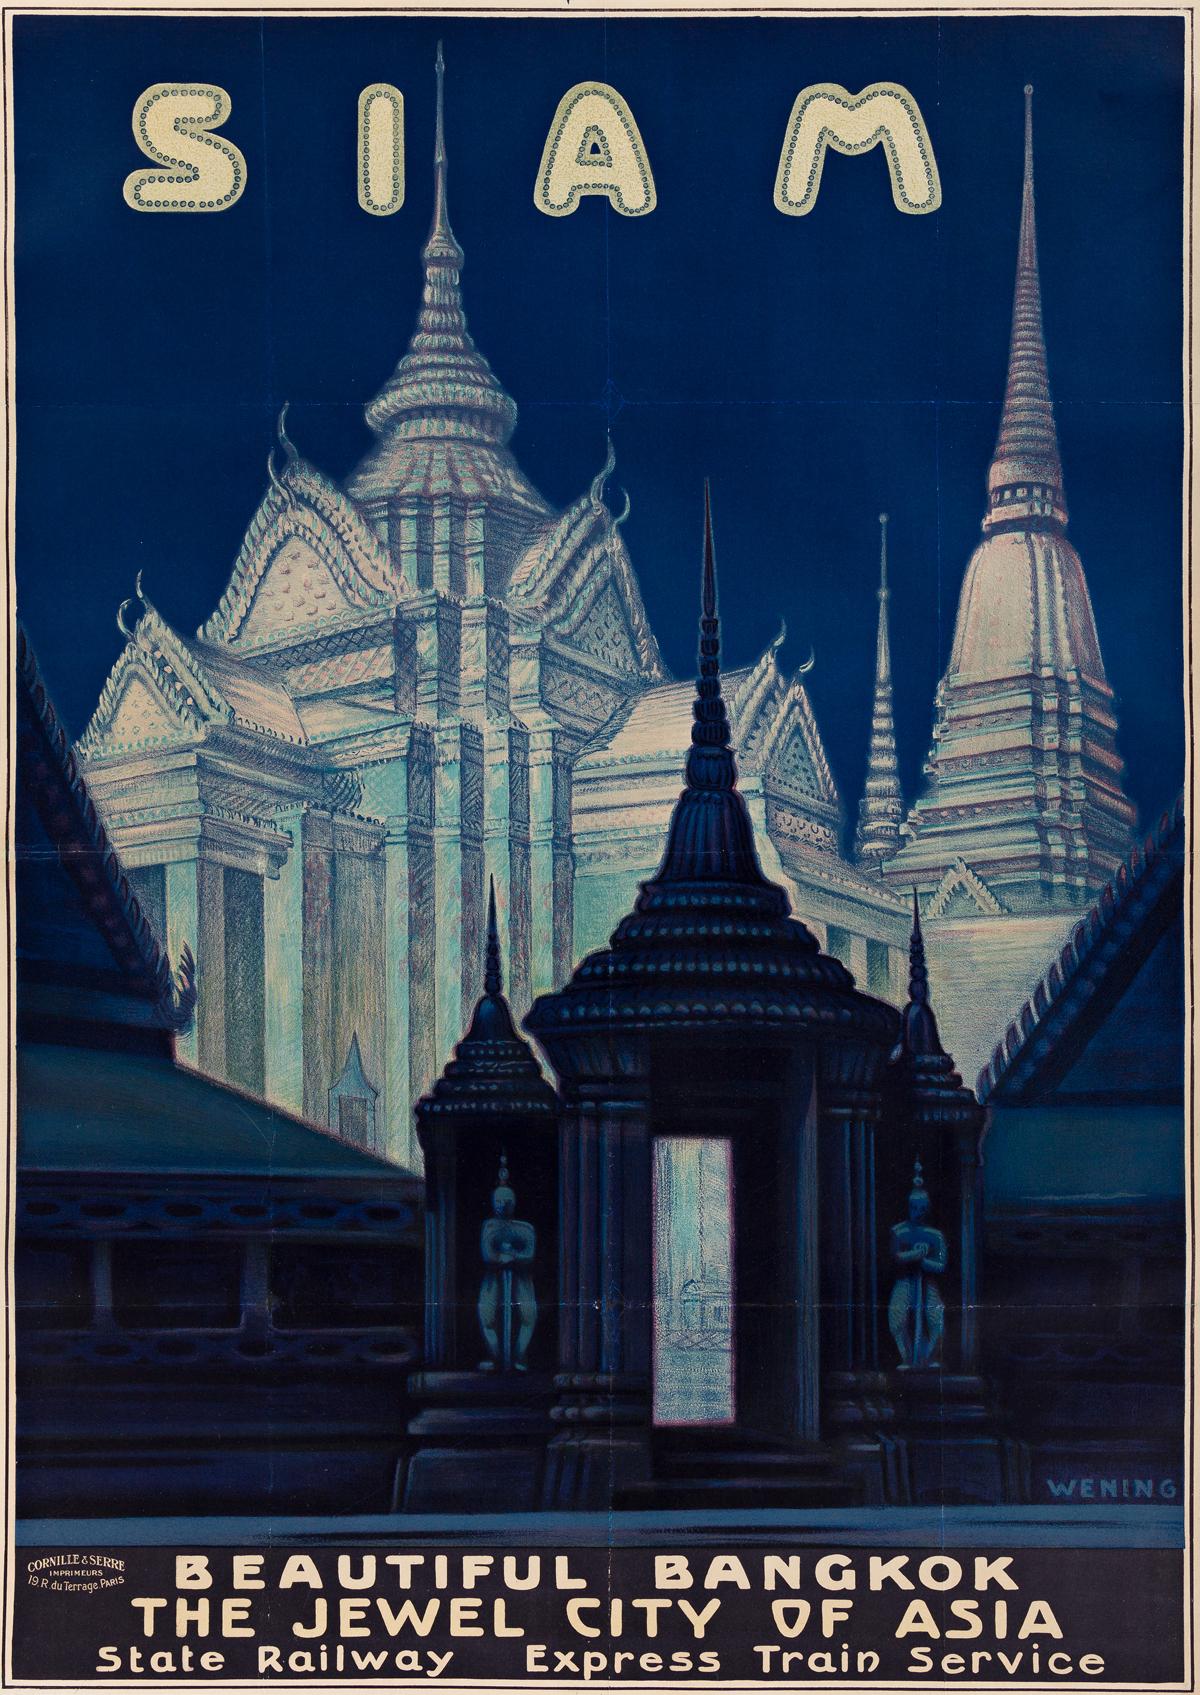 Michael Rudolf Wening 1893 1970 Siam Beautiful Bangkok